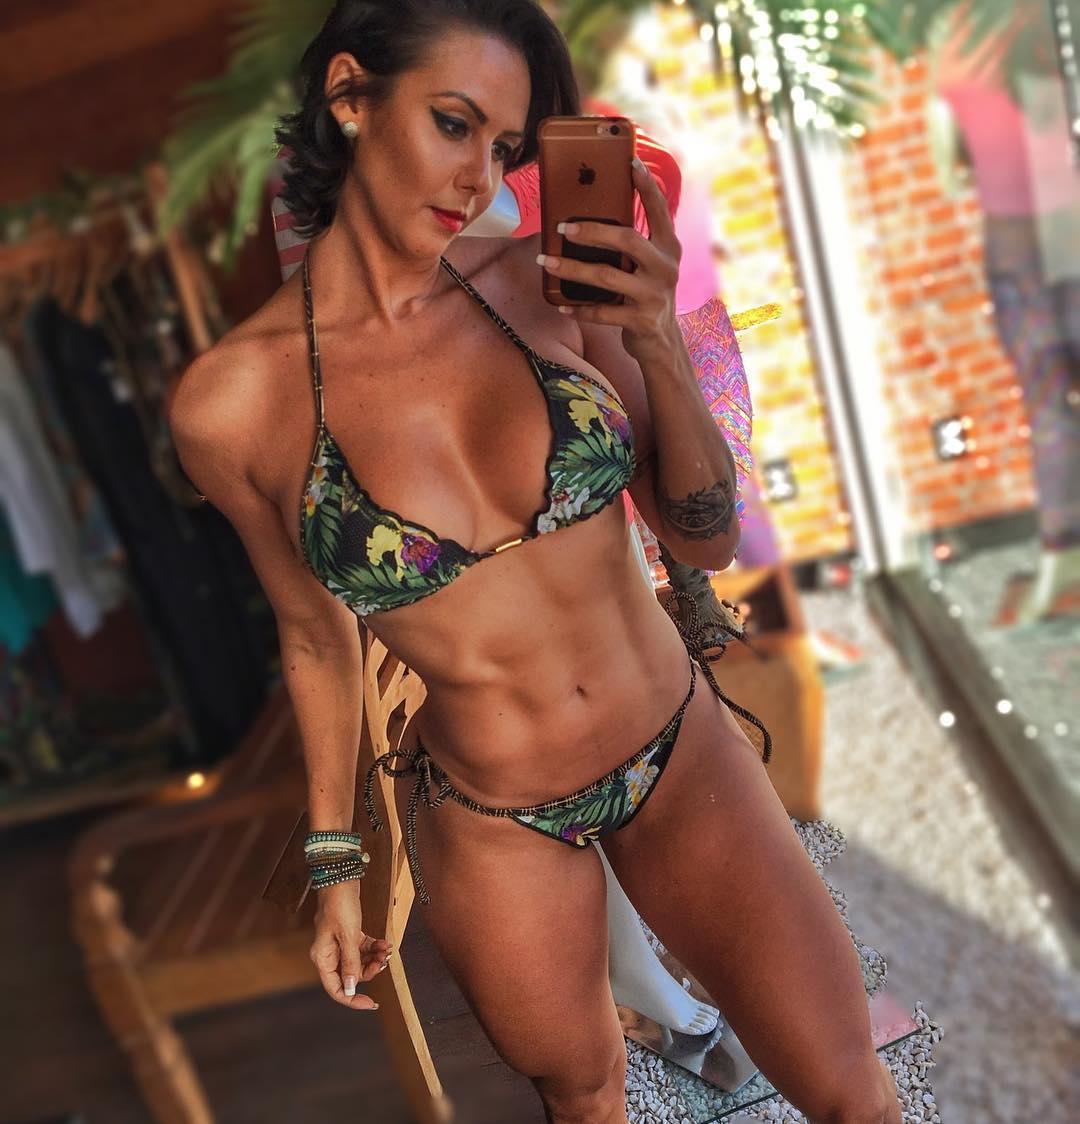 Beautiful bikini brazilian info model remember naked girls 18+